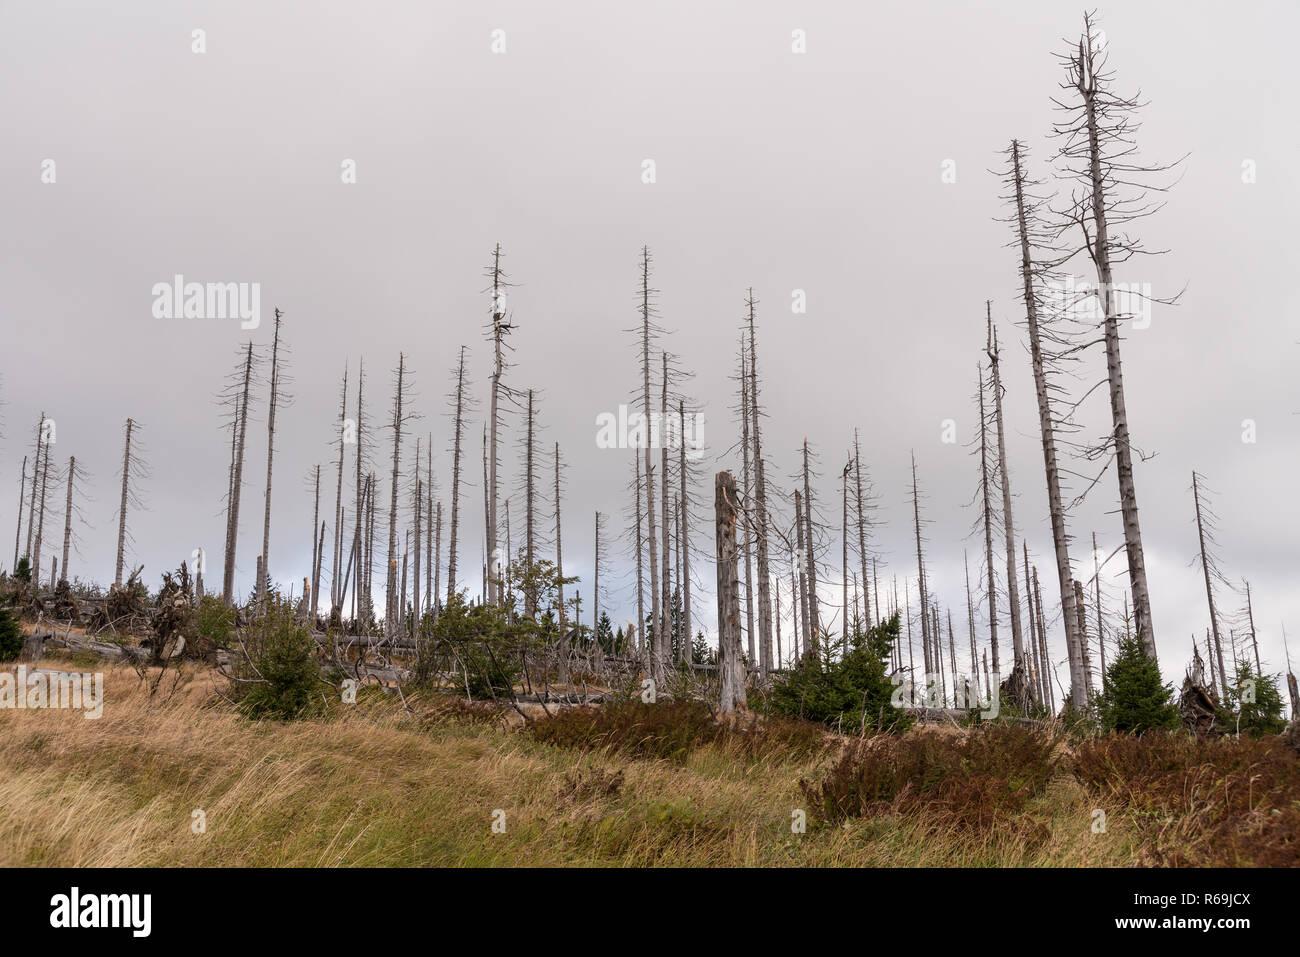 Bare Trees On Dreisesselberg After Bark Beetle Infestation - Stock Image